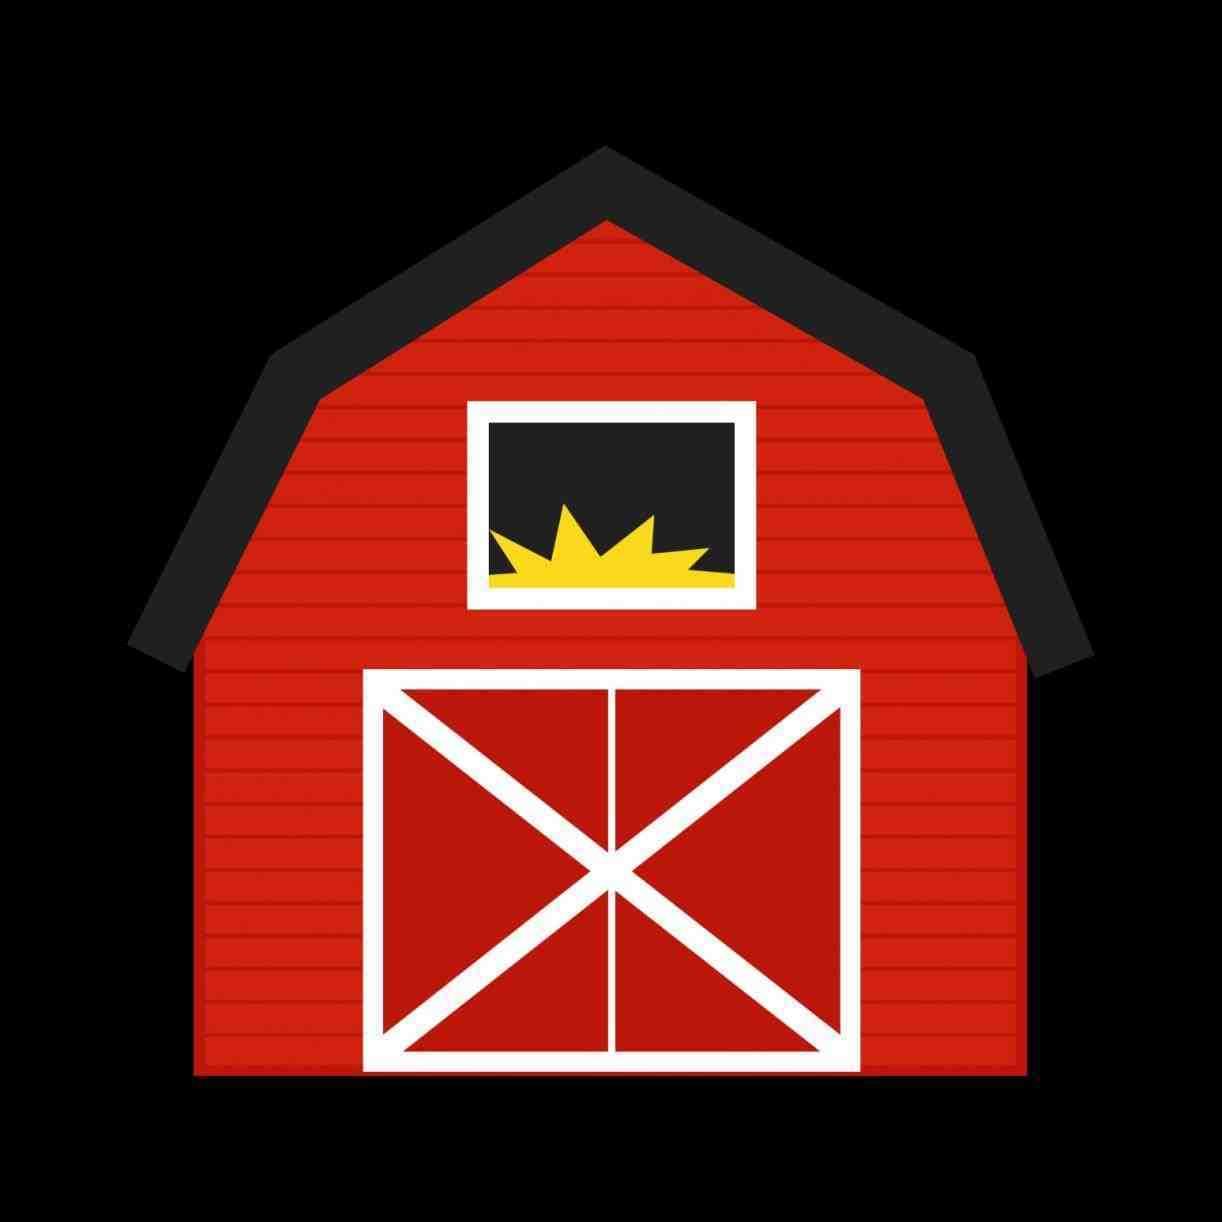 Barns makemoneyonlineusrhmakemoneyonlineus free red. Barn clipart animated